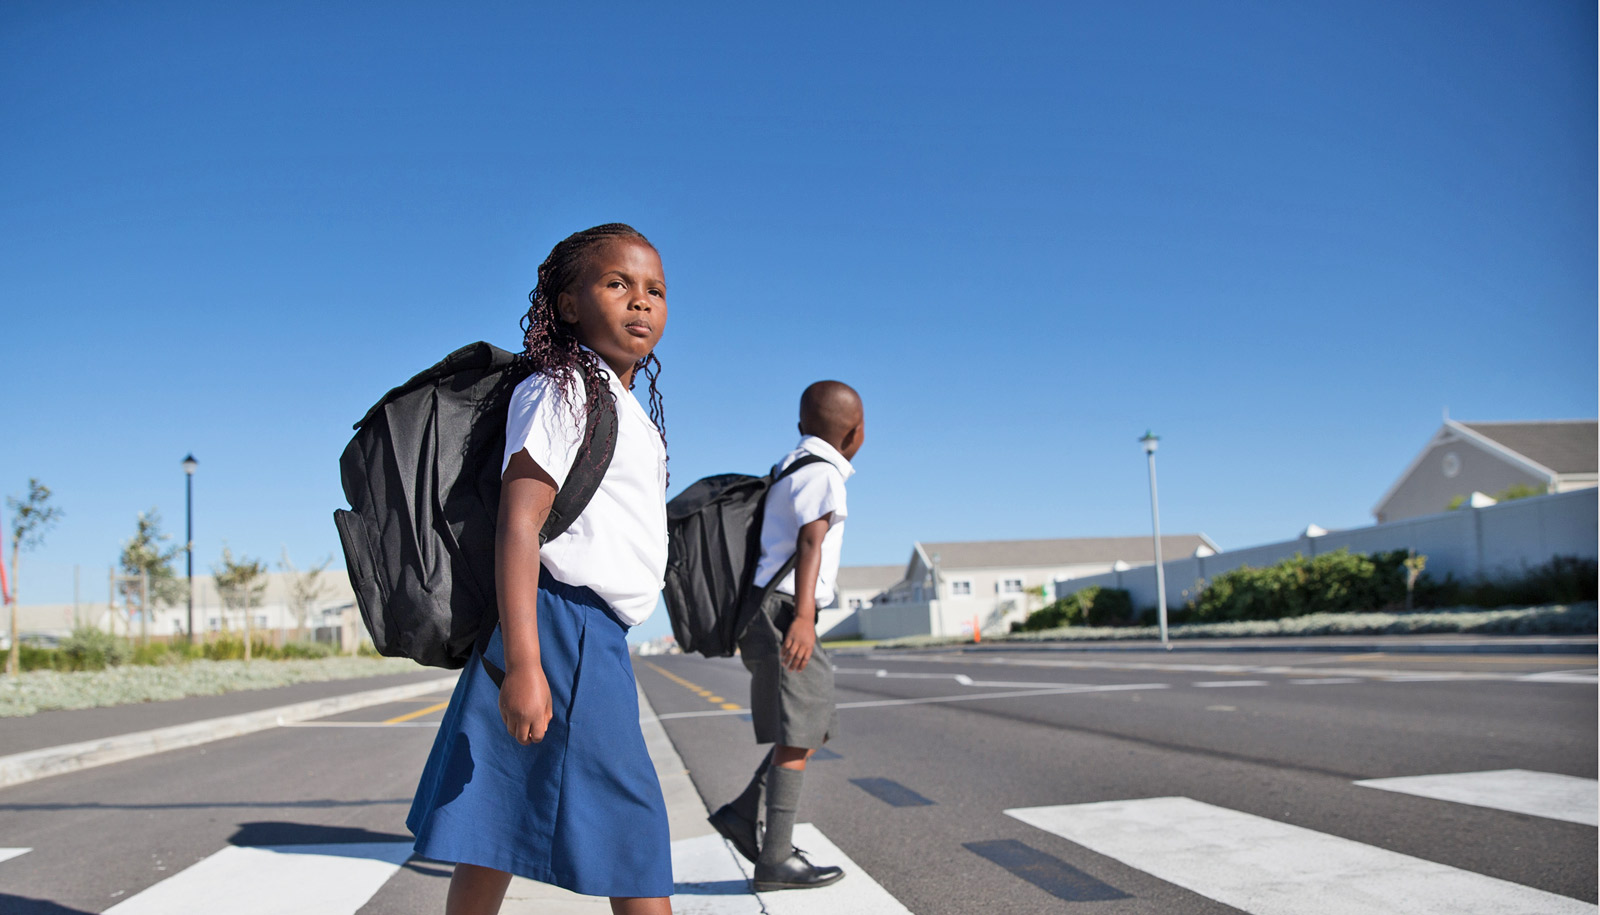 Kids Struggle To Safely Cross Busy Streets